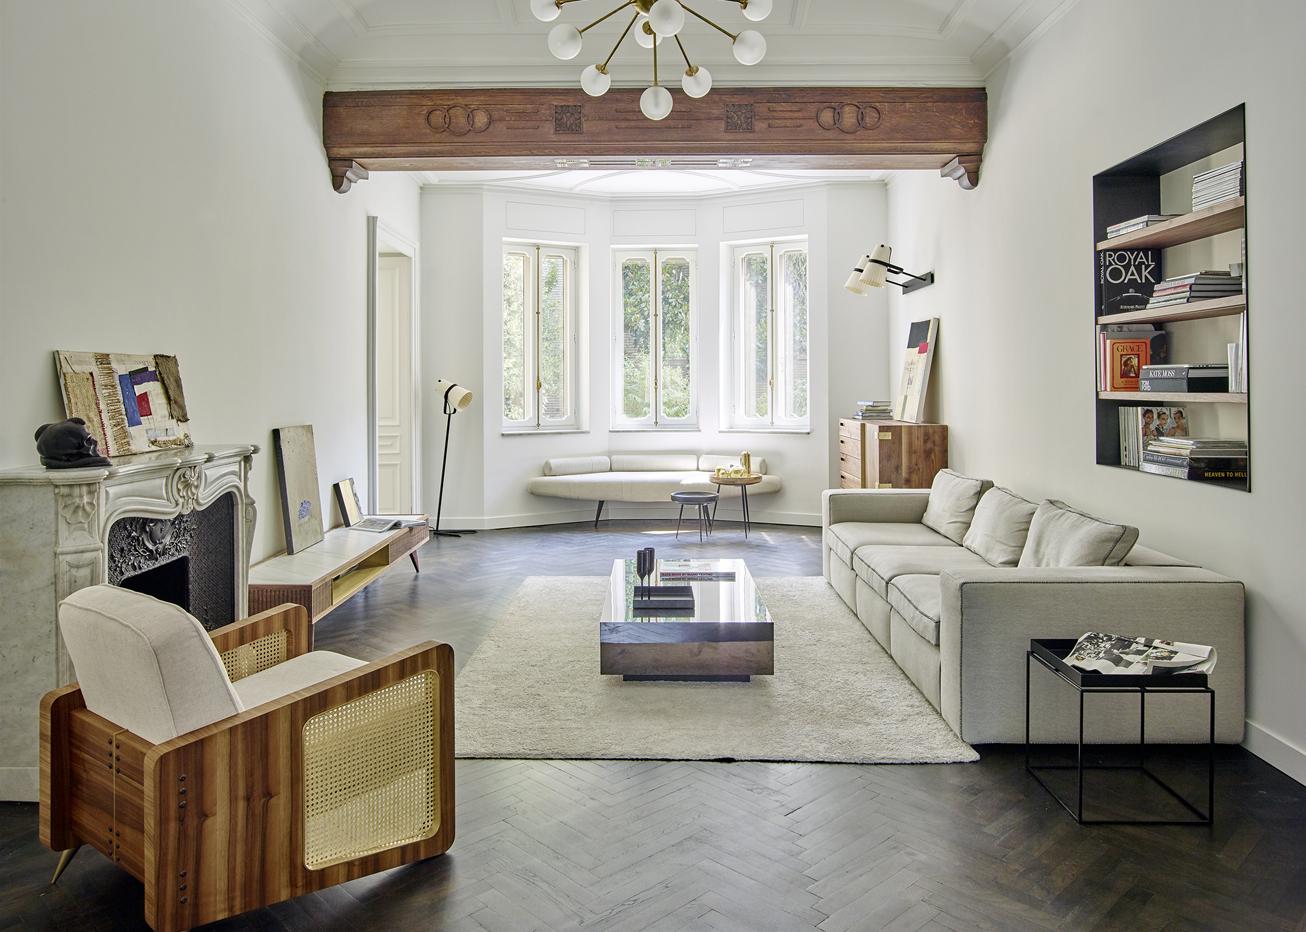 Torino stile novecento livingcorriere for Arredamento interni casa